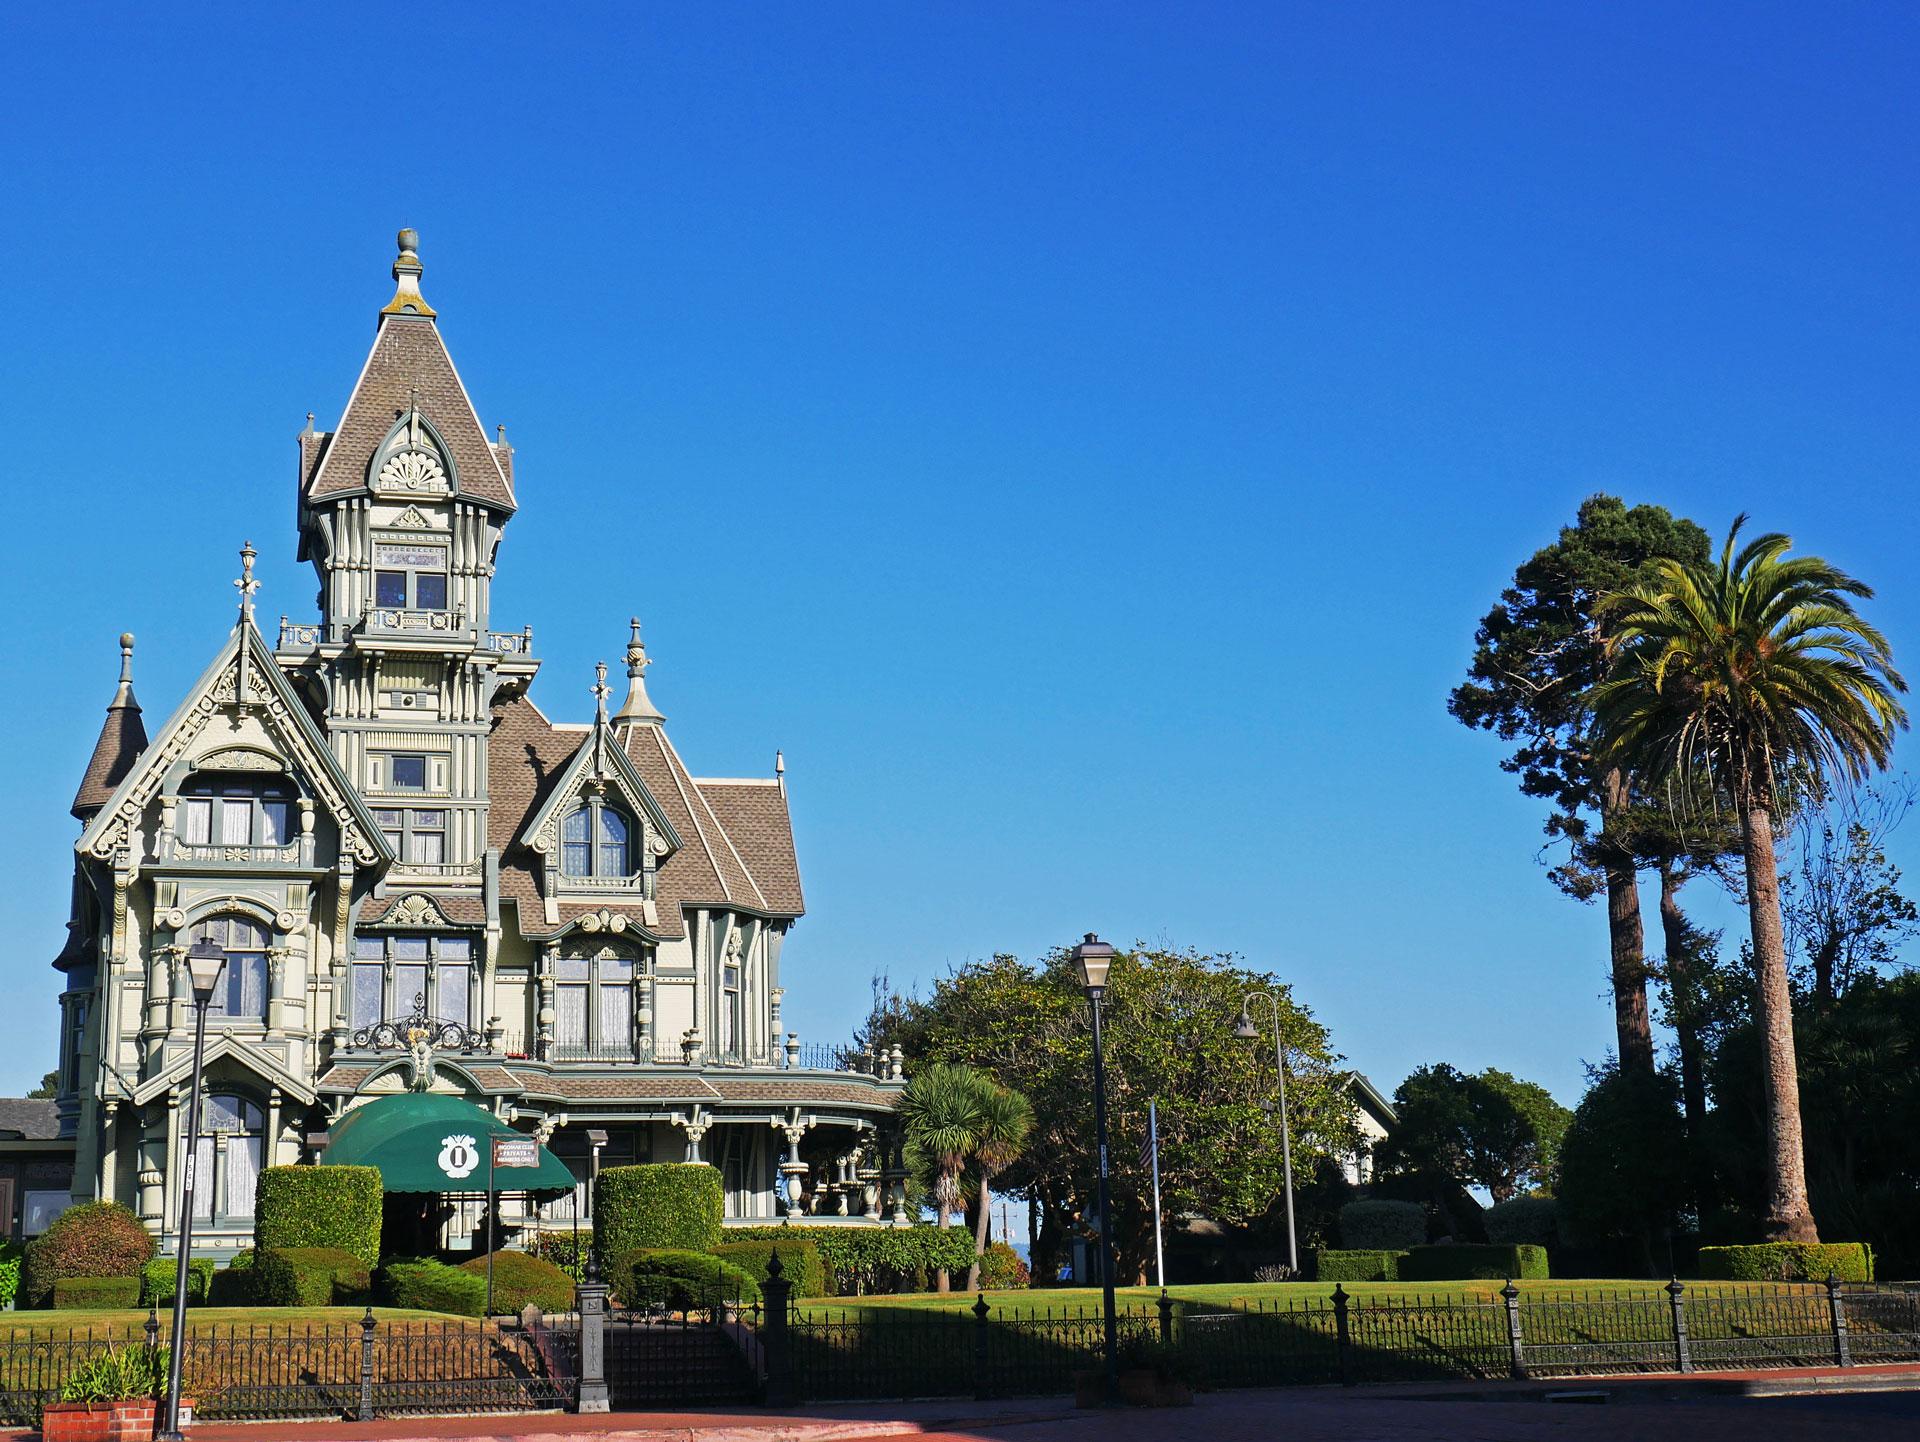 Victorian house Carson Mansion in Eureka, CA